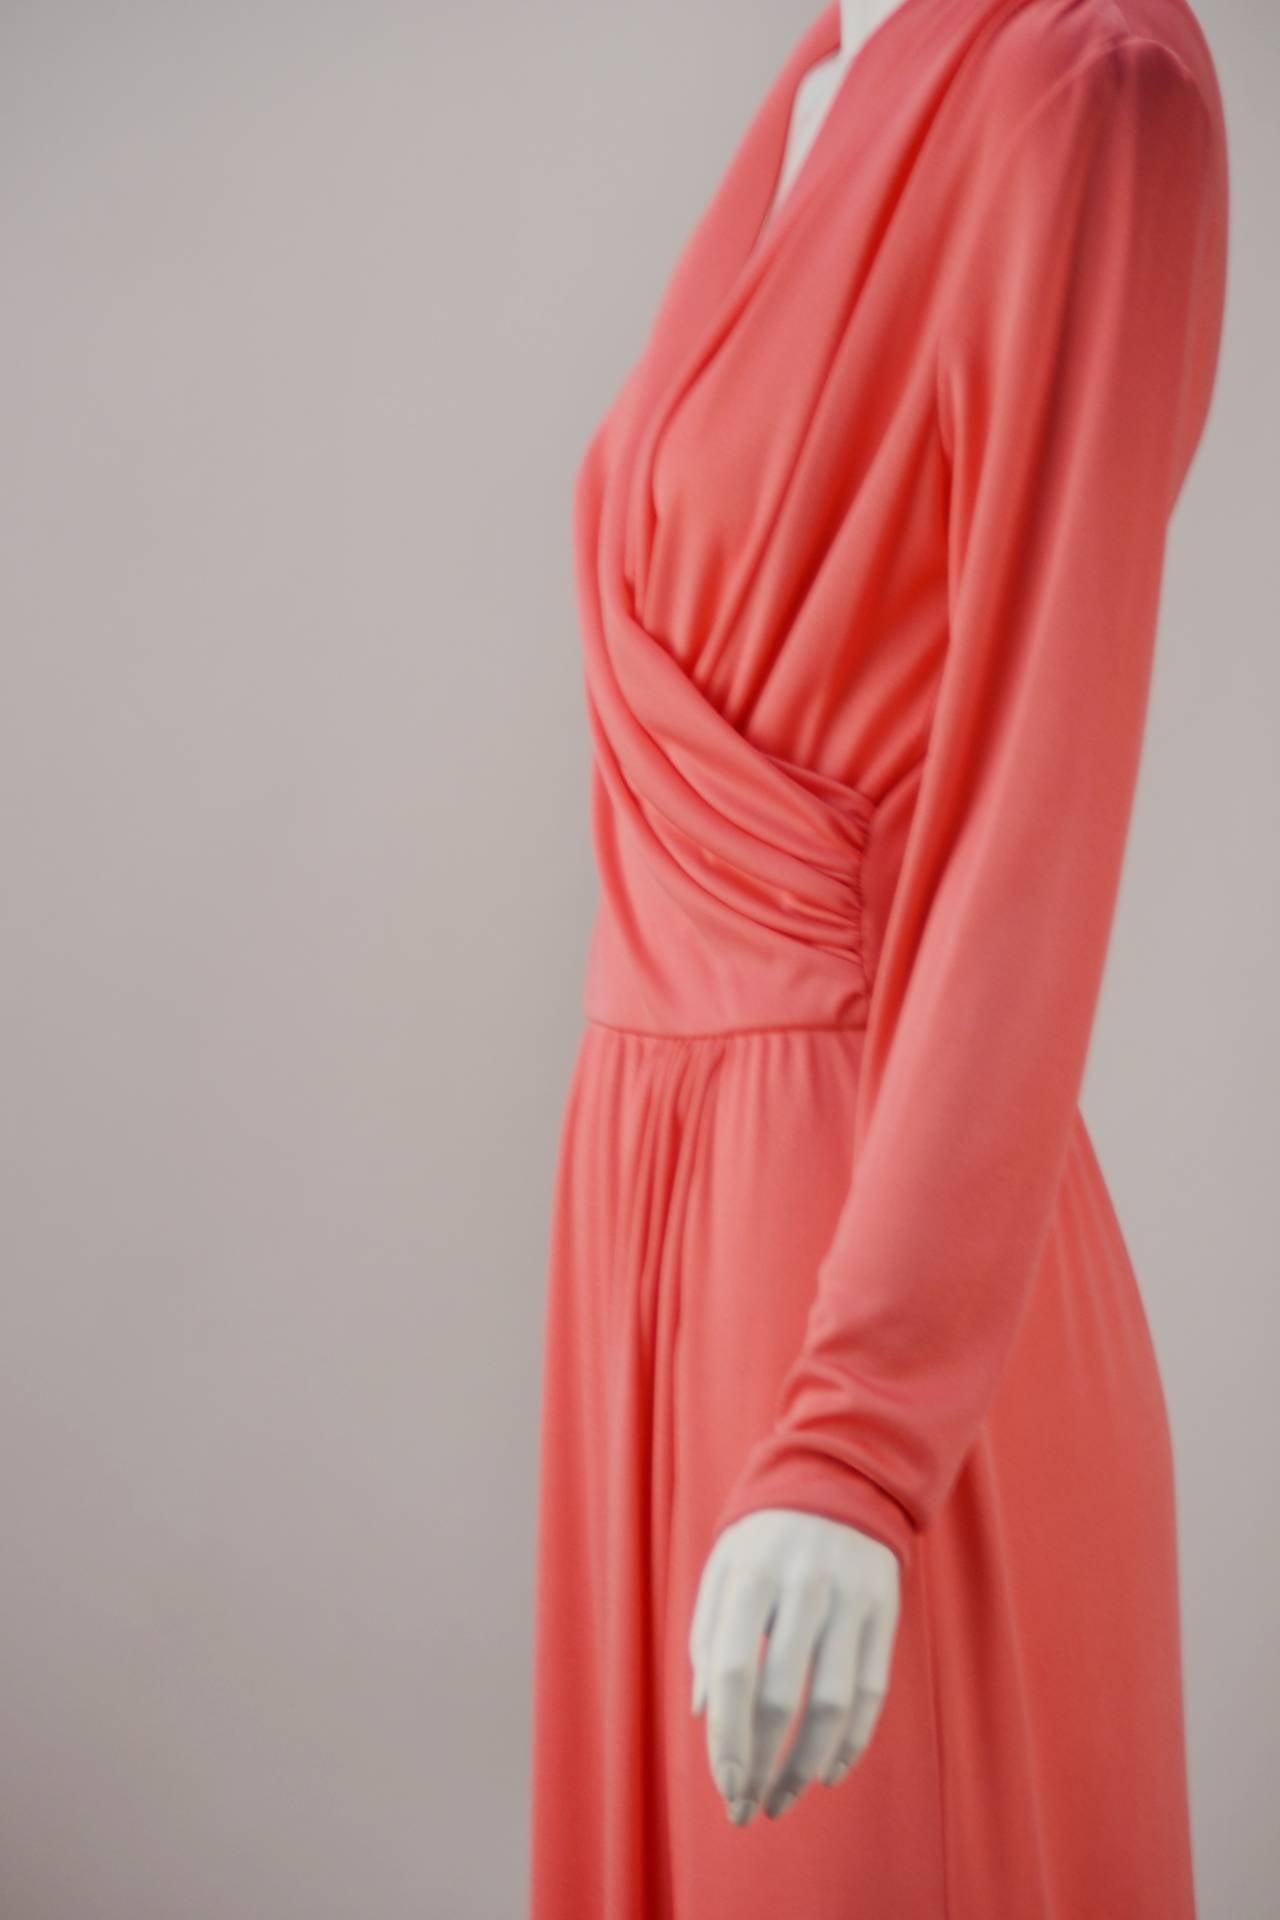 1970s Joy Stevens Coral Pink Maxi Dress For Sale 1